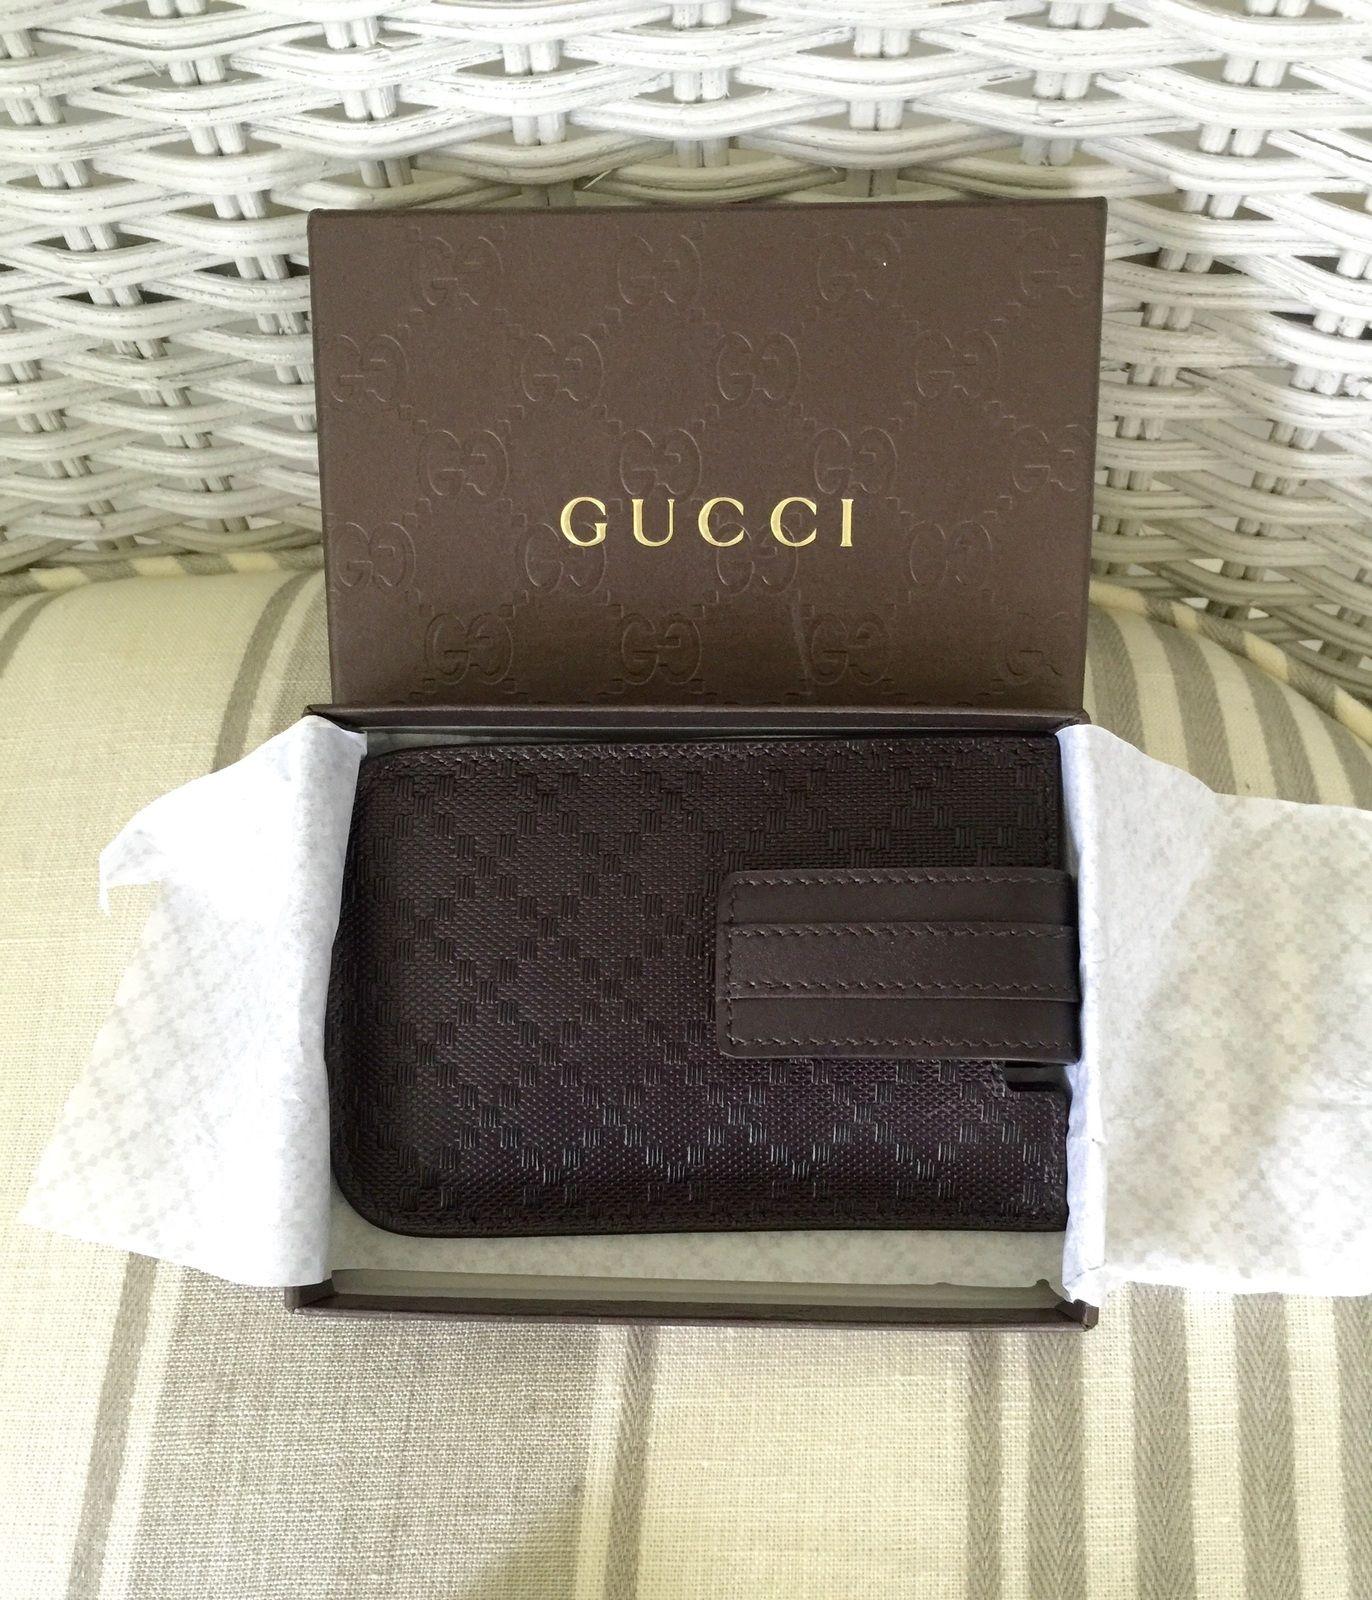 Gucci Custodia Brown Leather Card Holder NWT